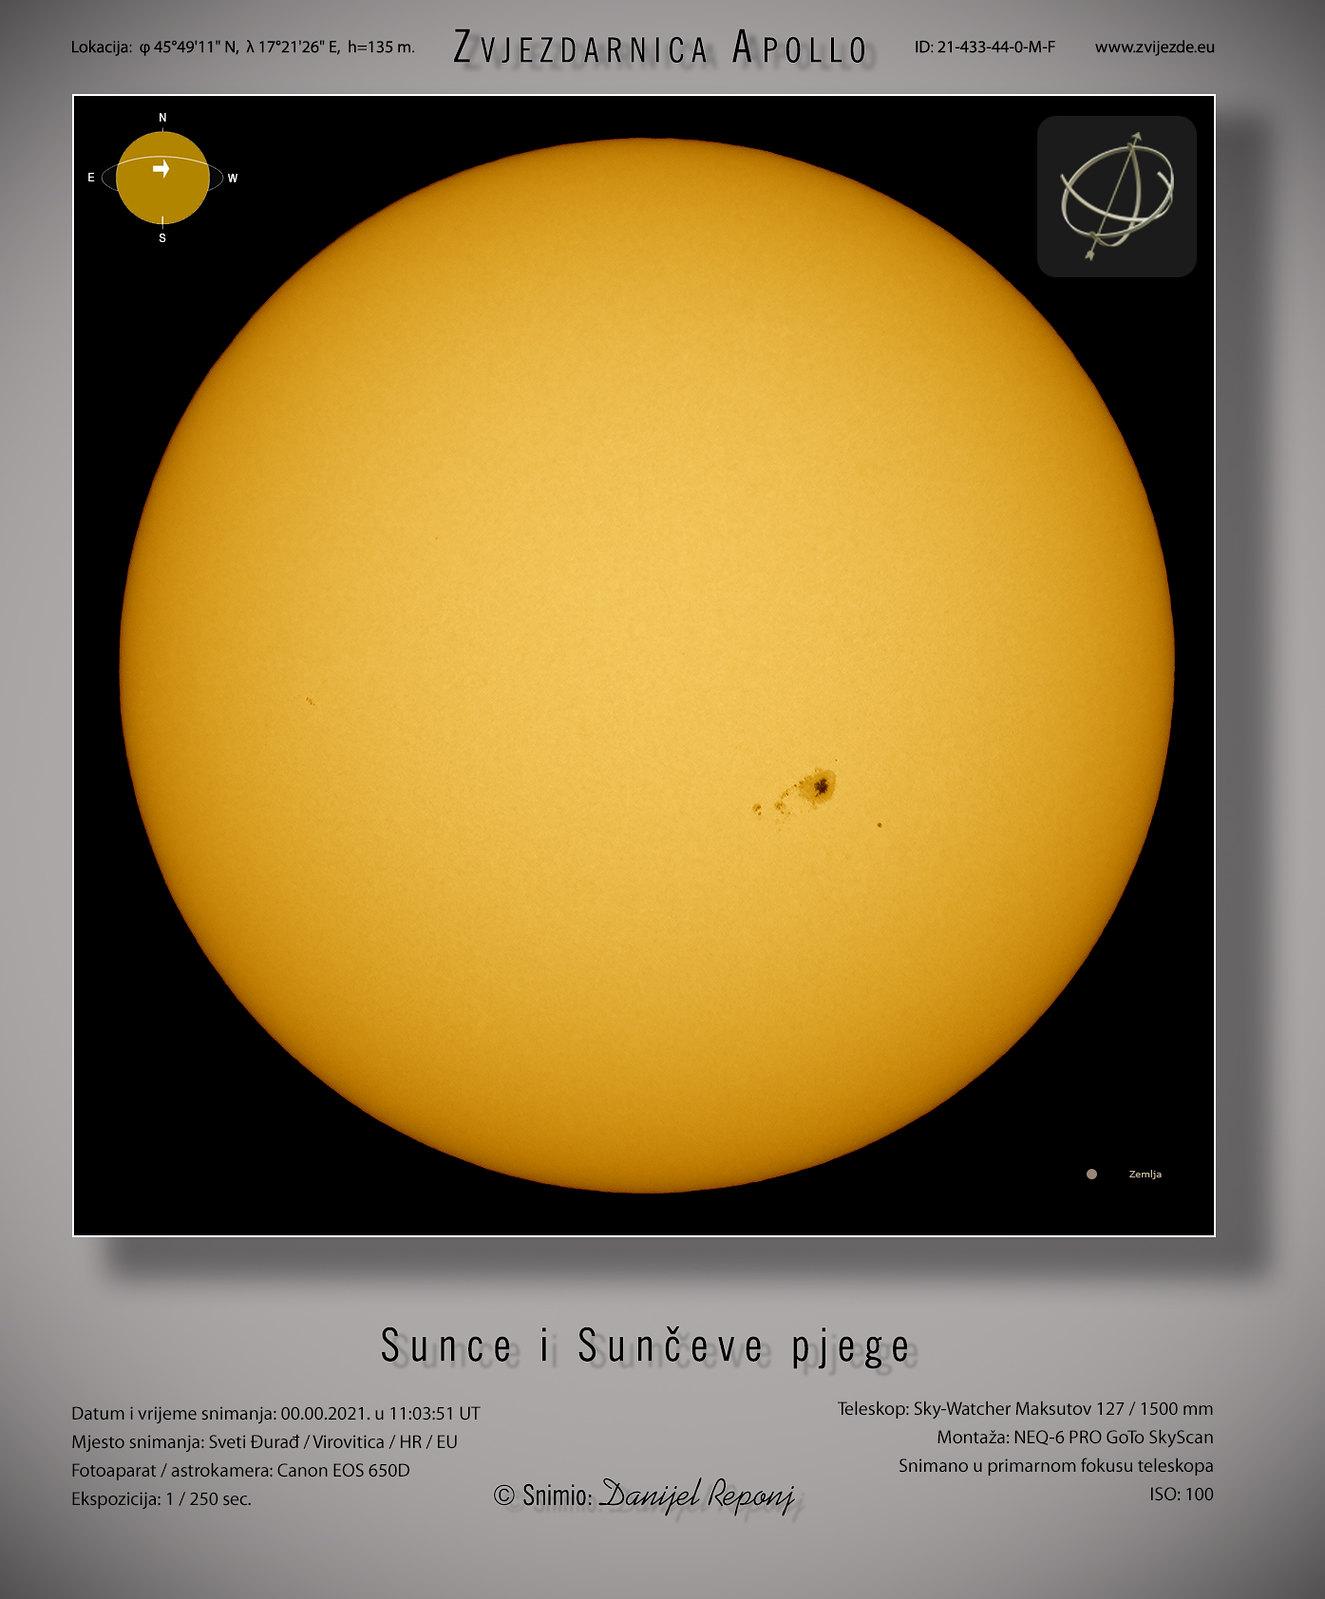 Sunce i Sunčeve pjege, 1.7.2021.